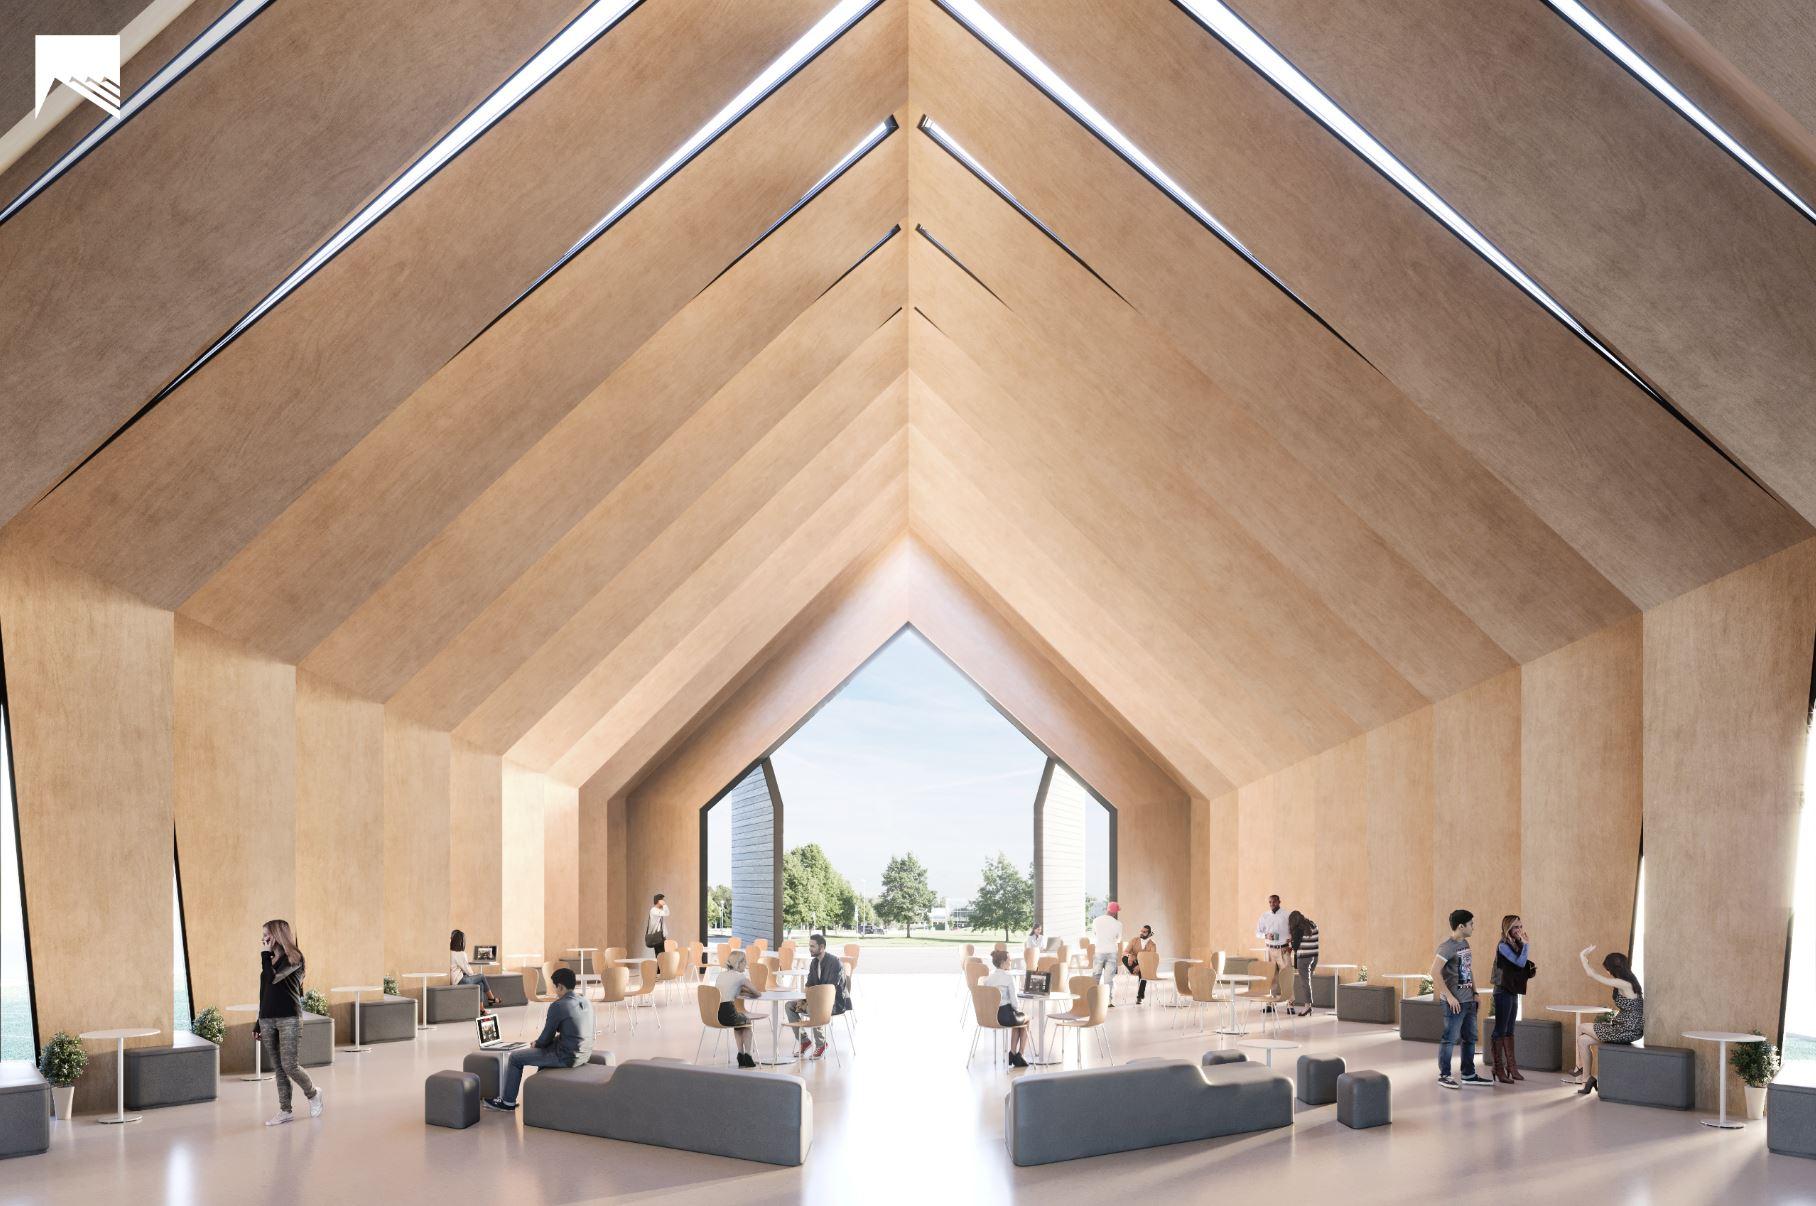 03_MIT_Mass_Timber_Design_Longhouse_Interior_01.JPG